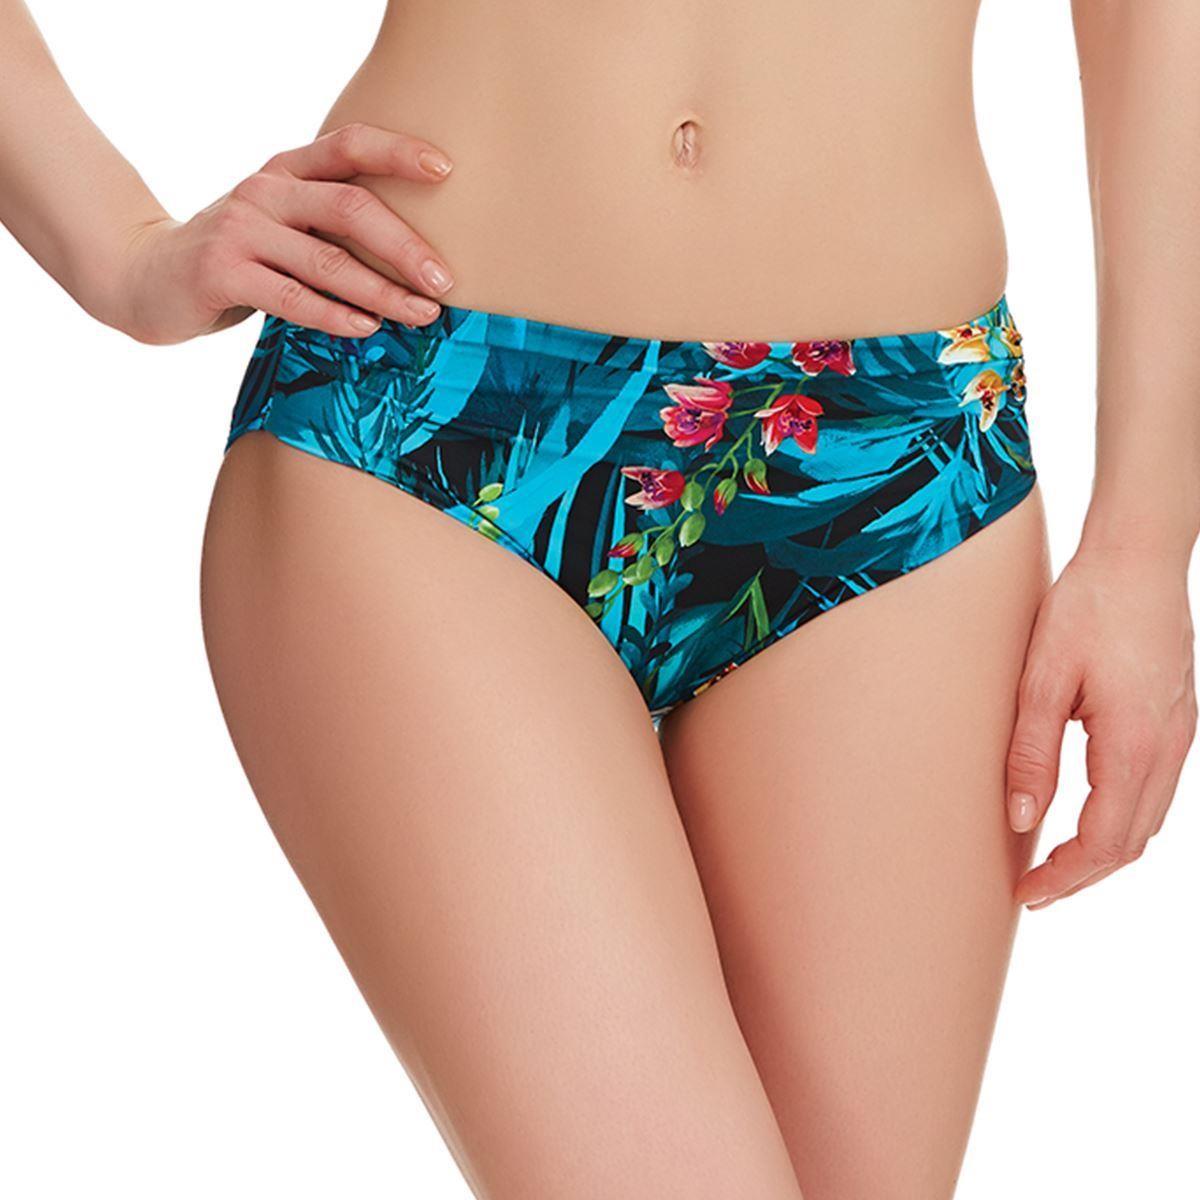 Fantasie Swimwear Seychelles Mid Rise Gathered Bikini Brief/Bottoms - Azure